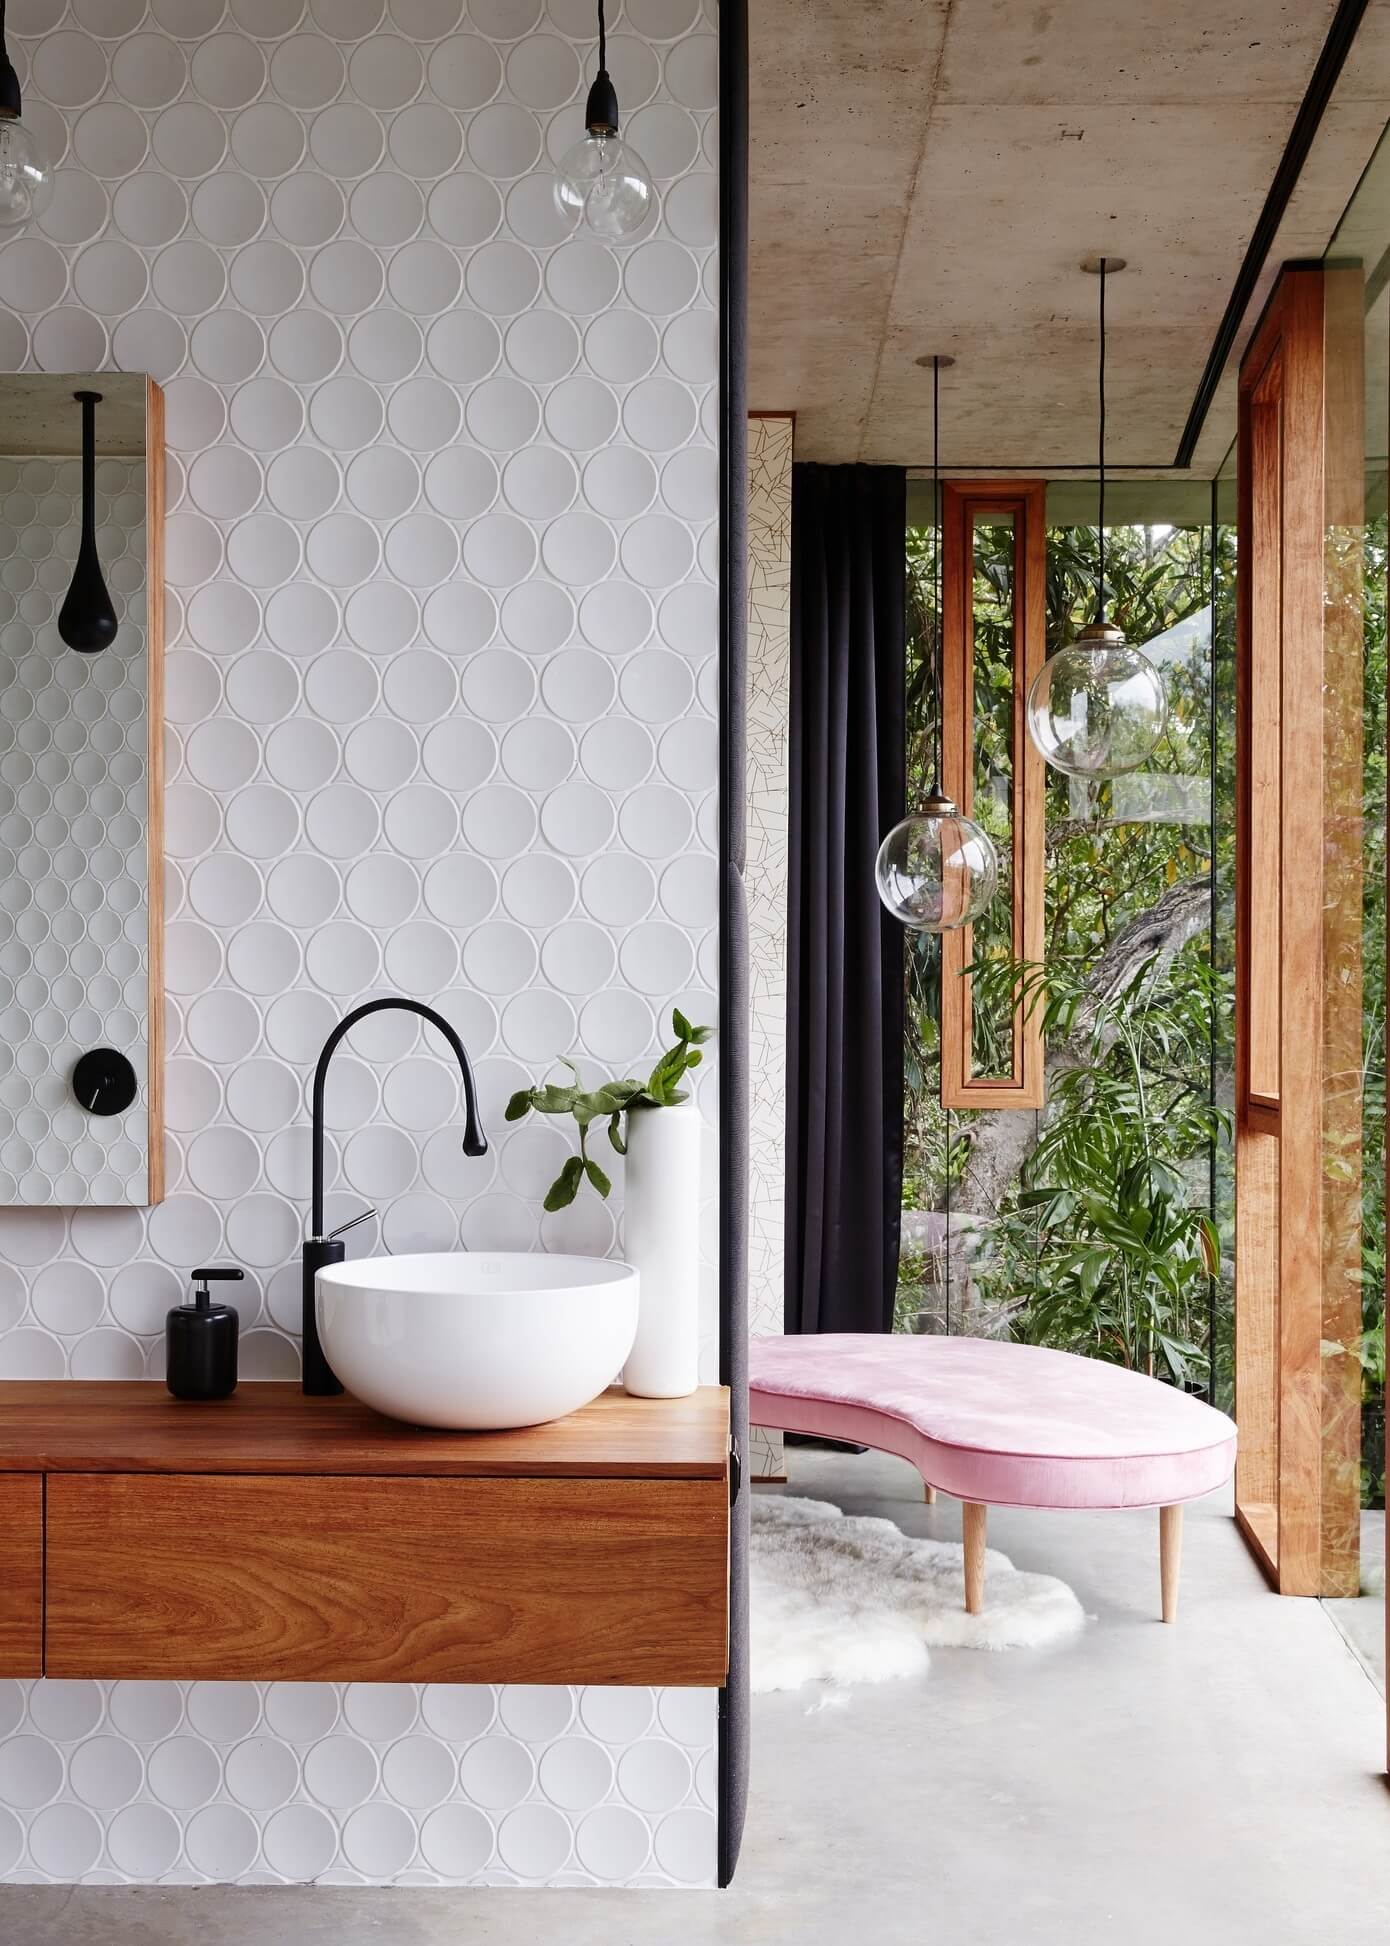 planchonella-house-jesse-bennett-architect-15